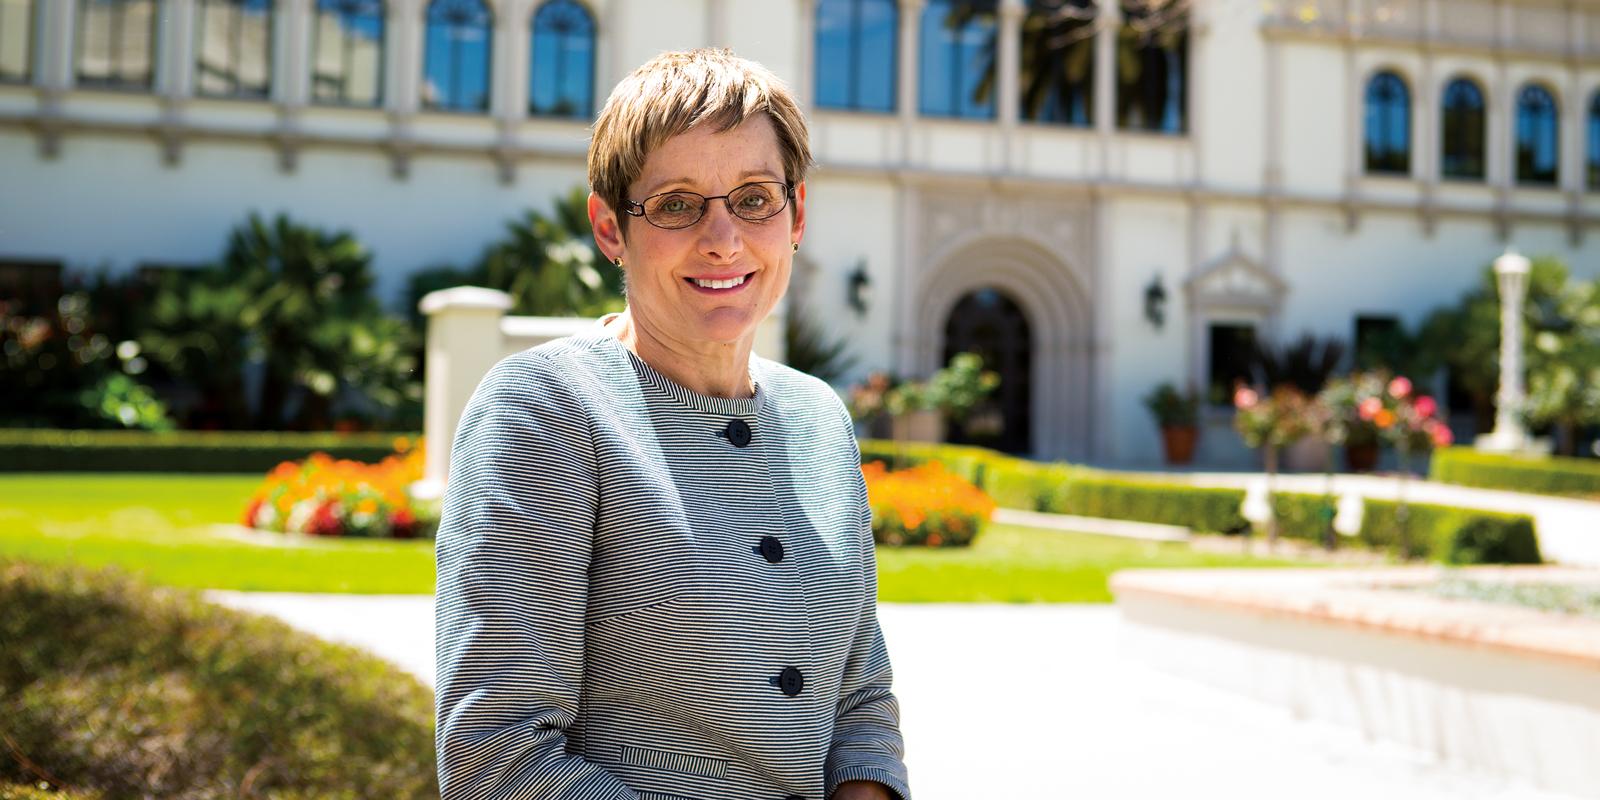 Former USD provost Juiie Sullivan